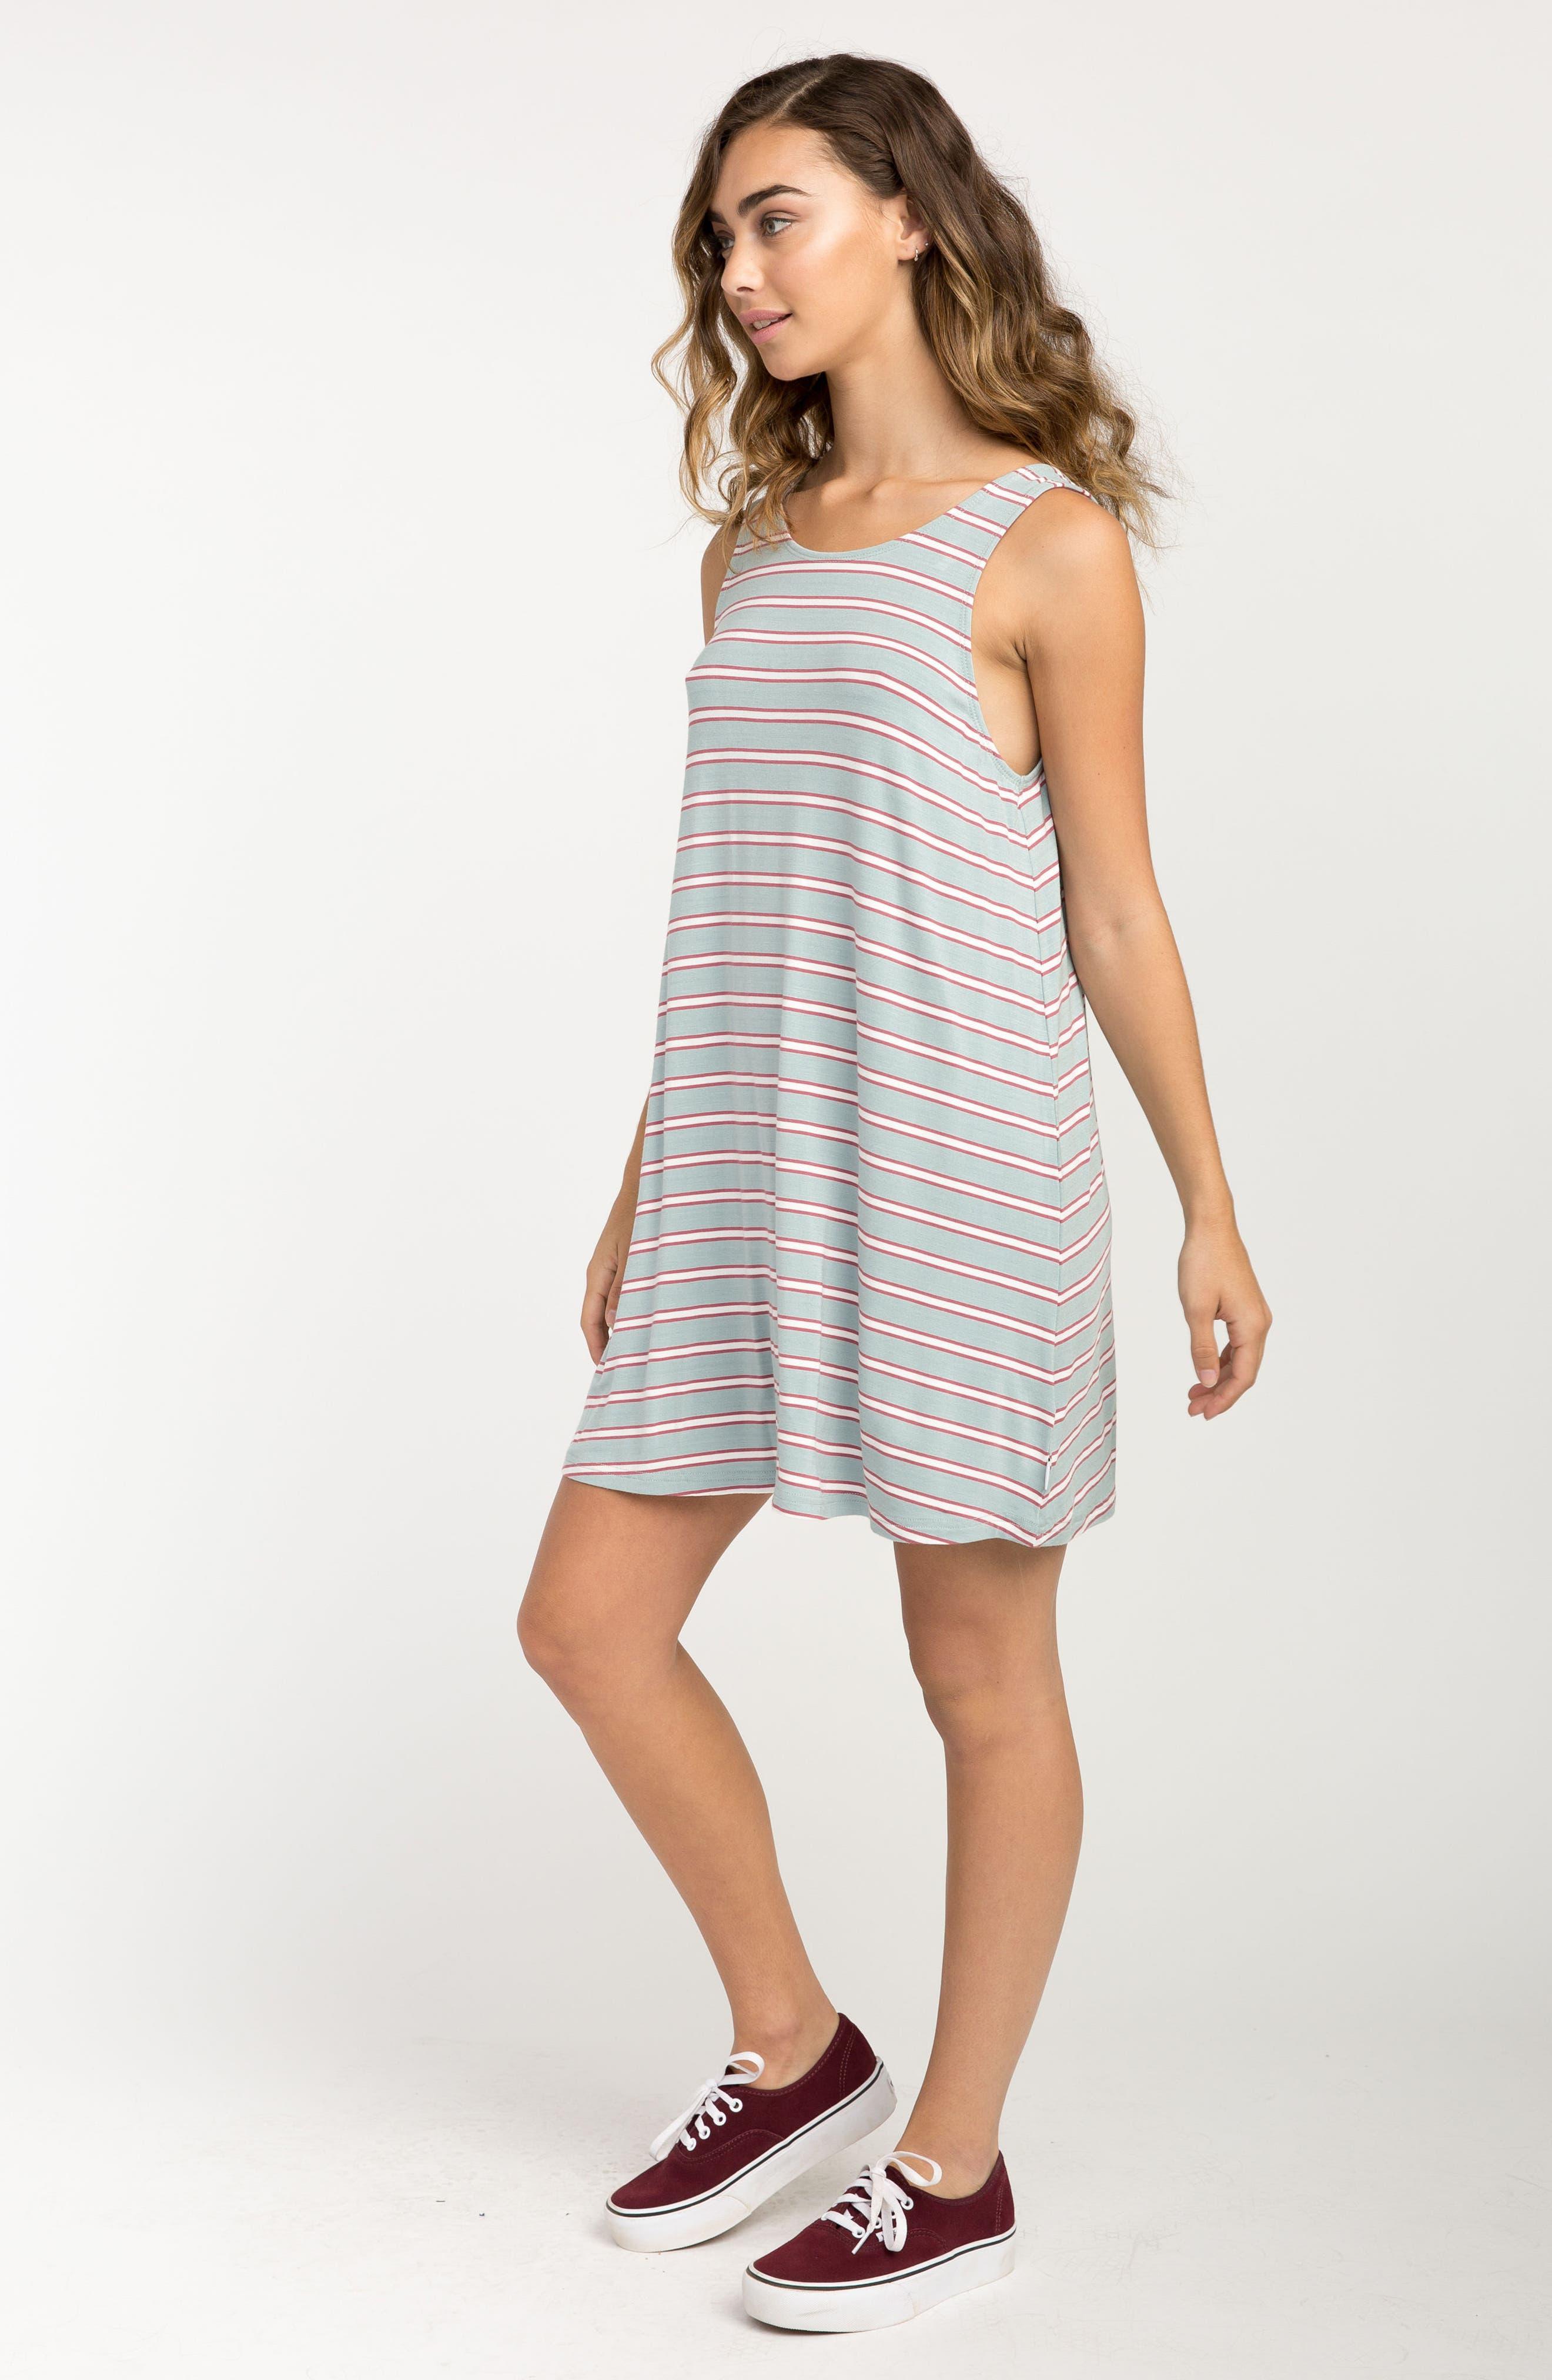 Lostlane Stripe Swing Dress,                             Alternate thumbnail 4, color,                             Cloud Blue